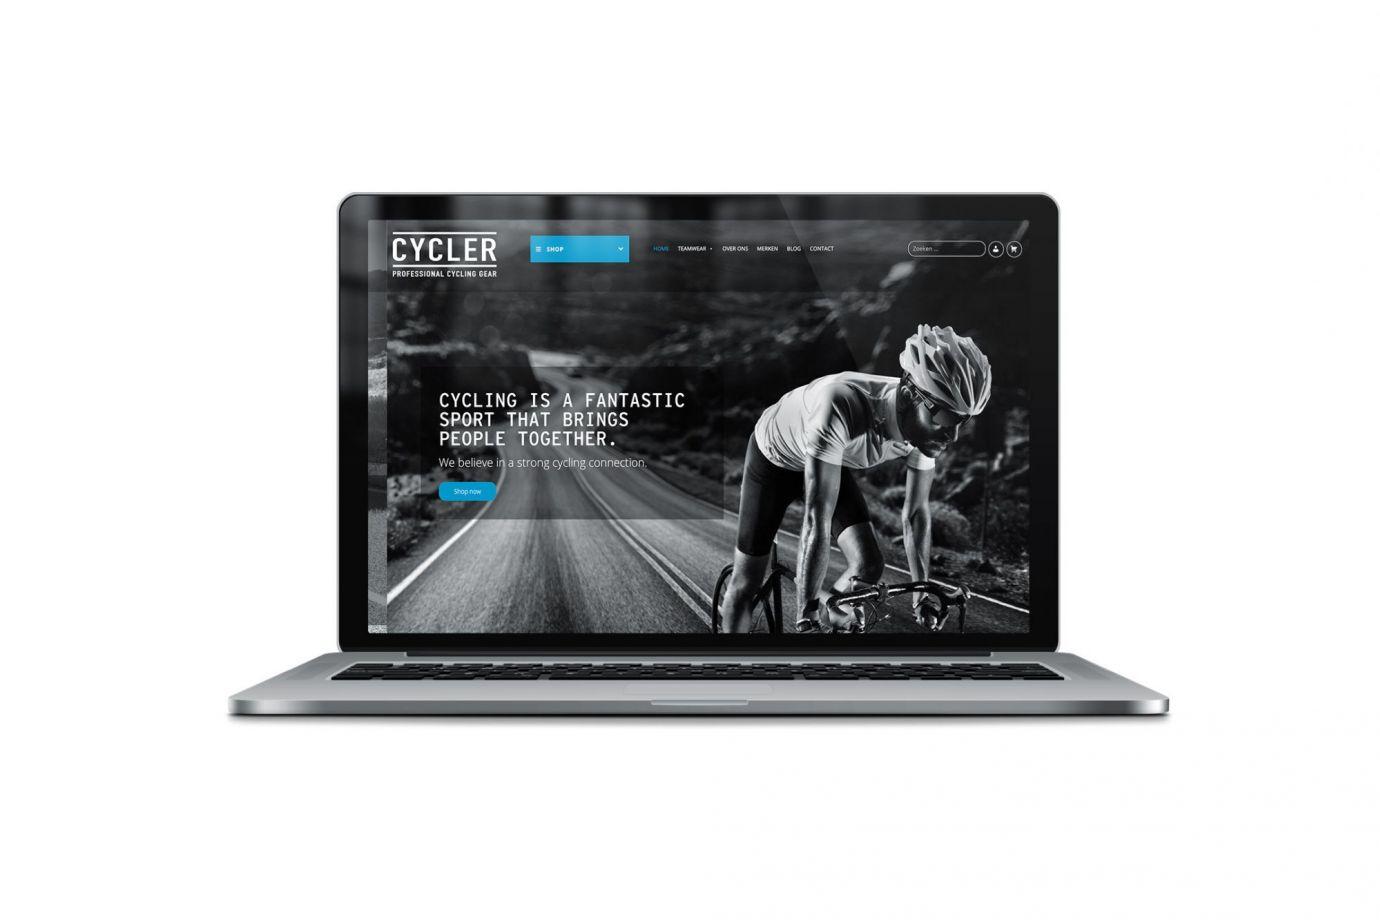 Cycler webshop